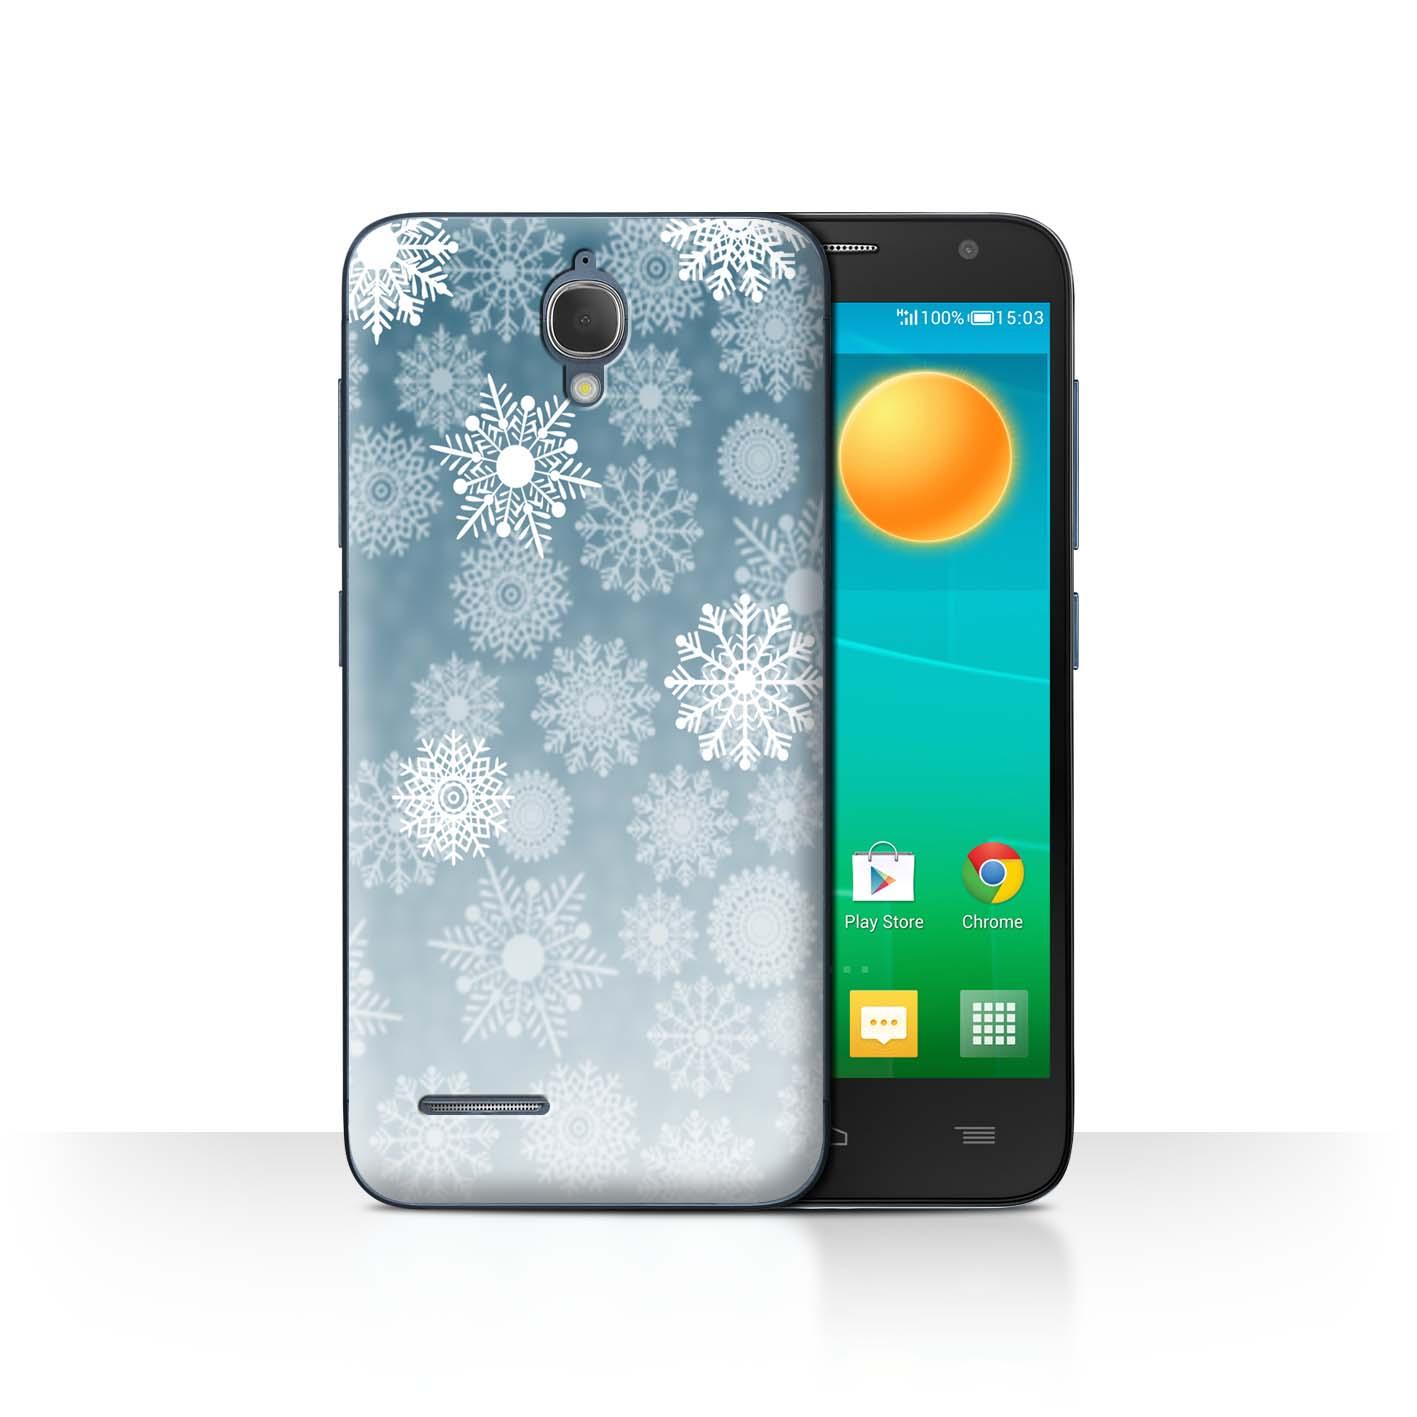 STUFF4-Back-Case-Cover-Skin-for-Alcatel-Idol-2-Mini-Snowflake-Mist